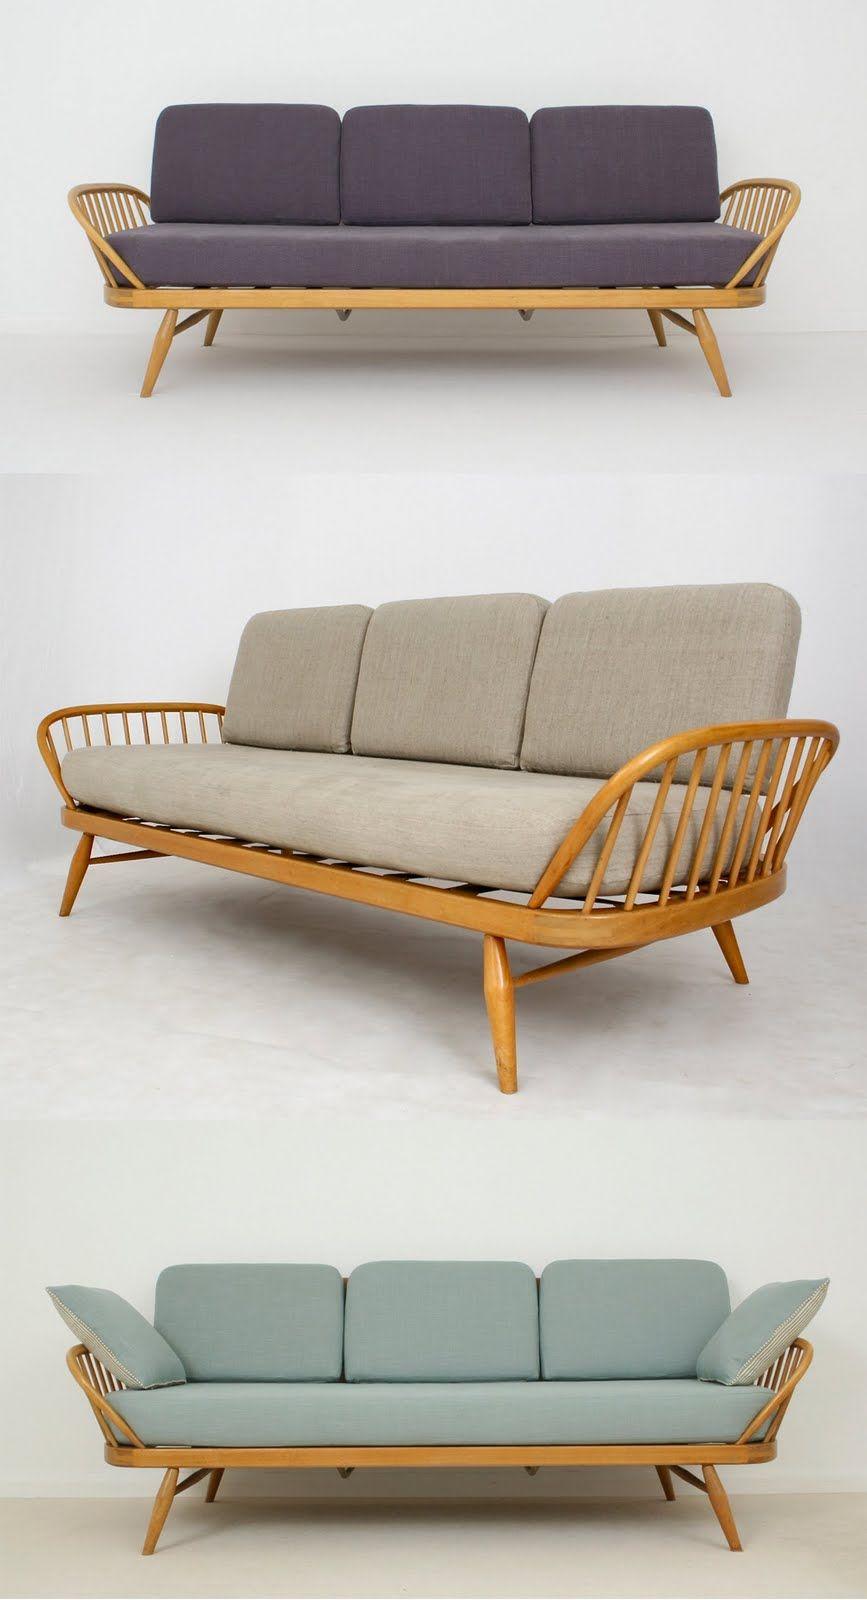 Best 25 Ercol Sofa Ideas On Pinterest Retro Sofa